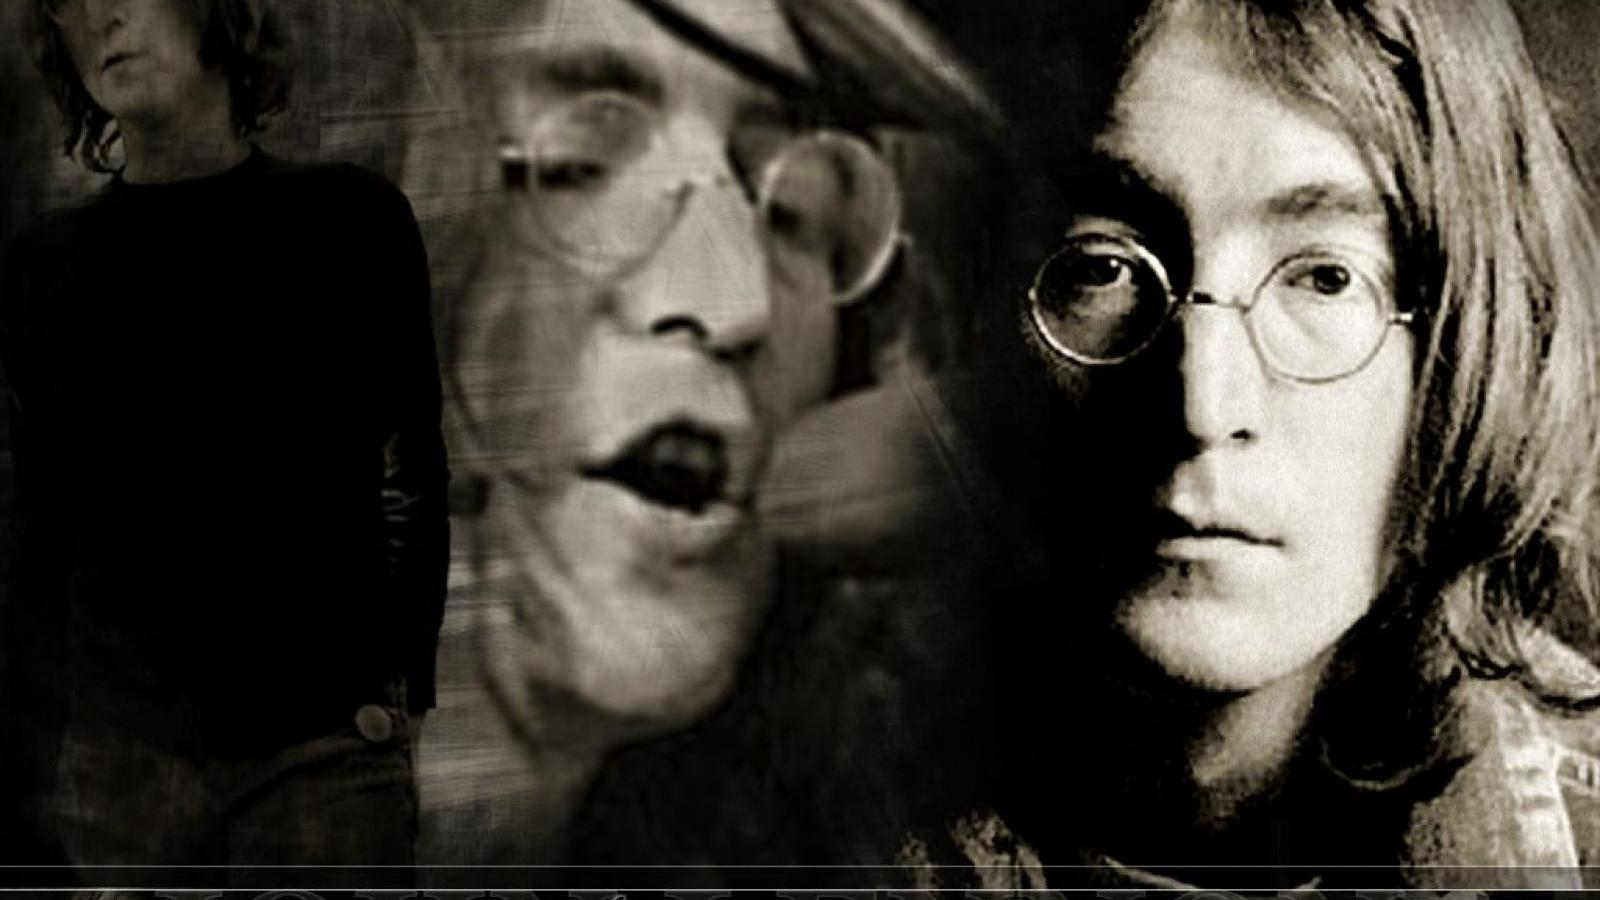 John Lennon Imagine 23 Widescreen Wallpaper 1600x1200 Download Resolutions Desktop 1600x900